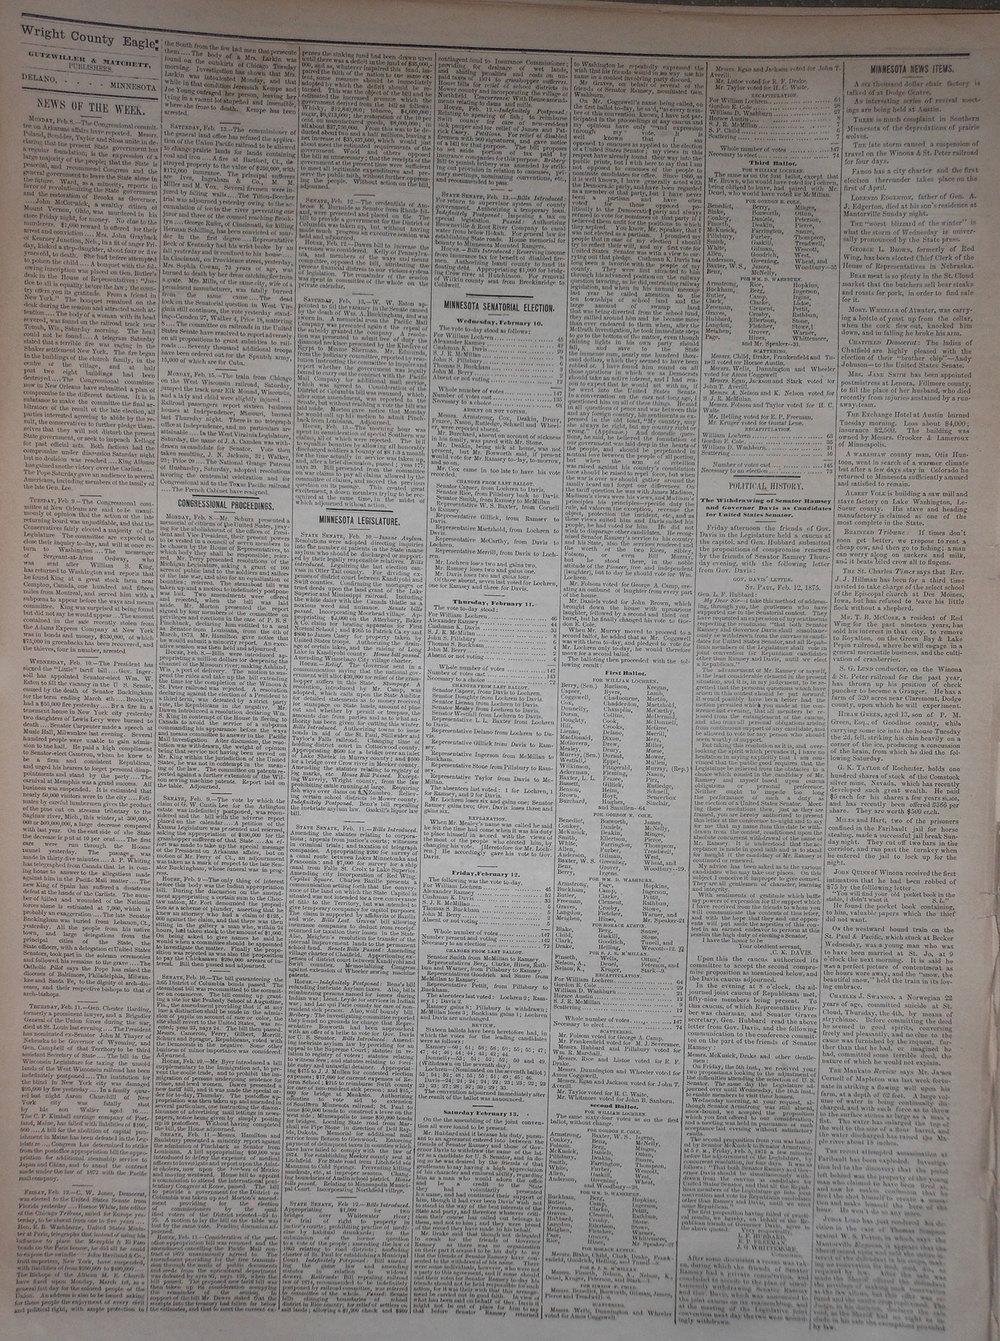 2/17/1875, p2